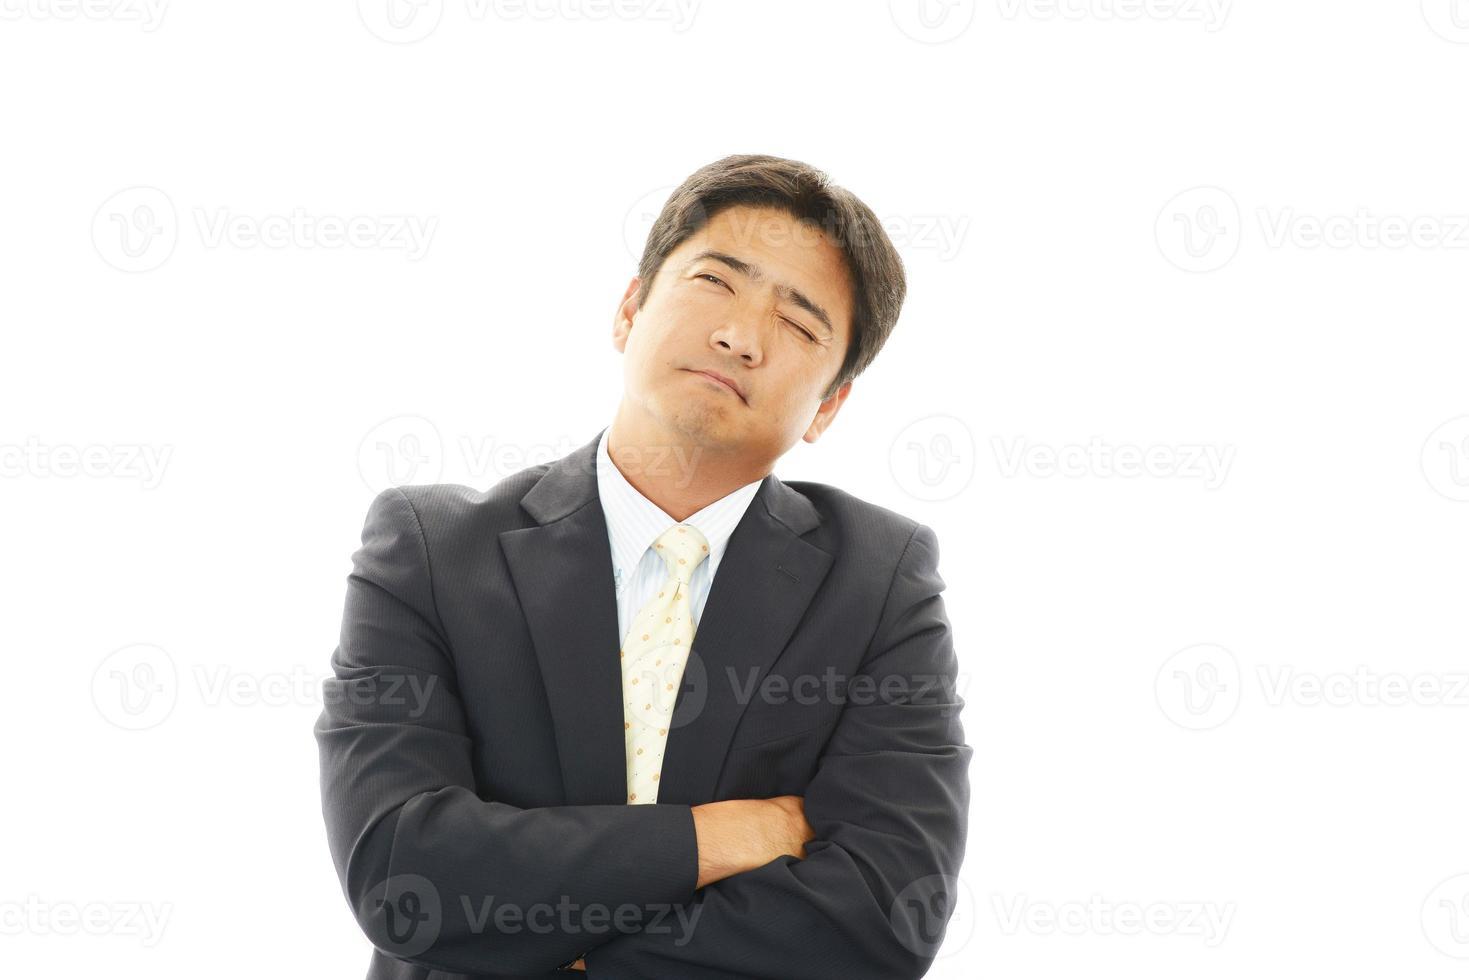 ontevreden Aziatische zakenman foto